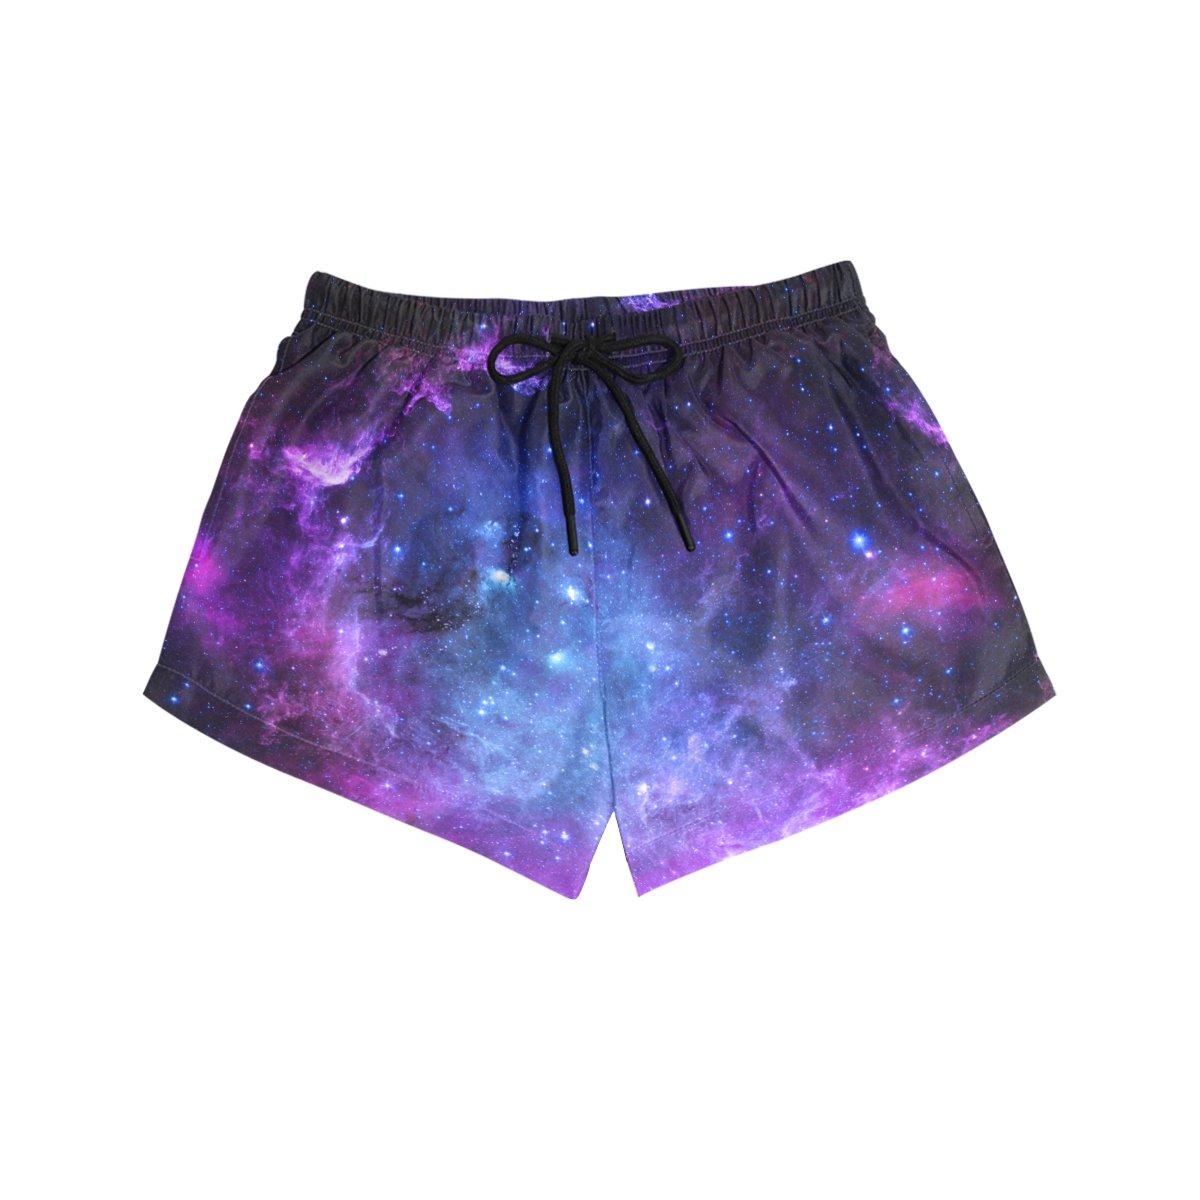 U LIFE Galaxy Space Universe Stars Women's Beach Shorts Pants Summer Yoga Gym Sports Girls Short